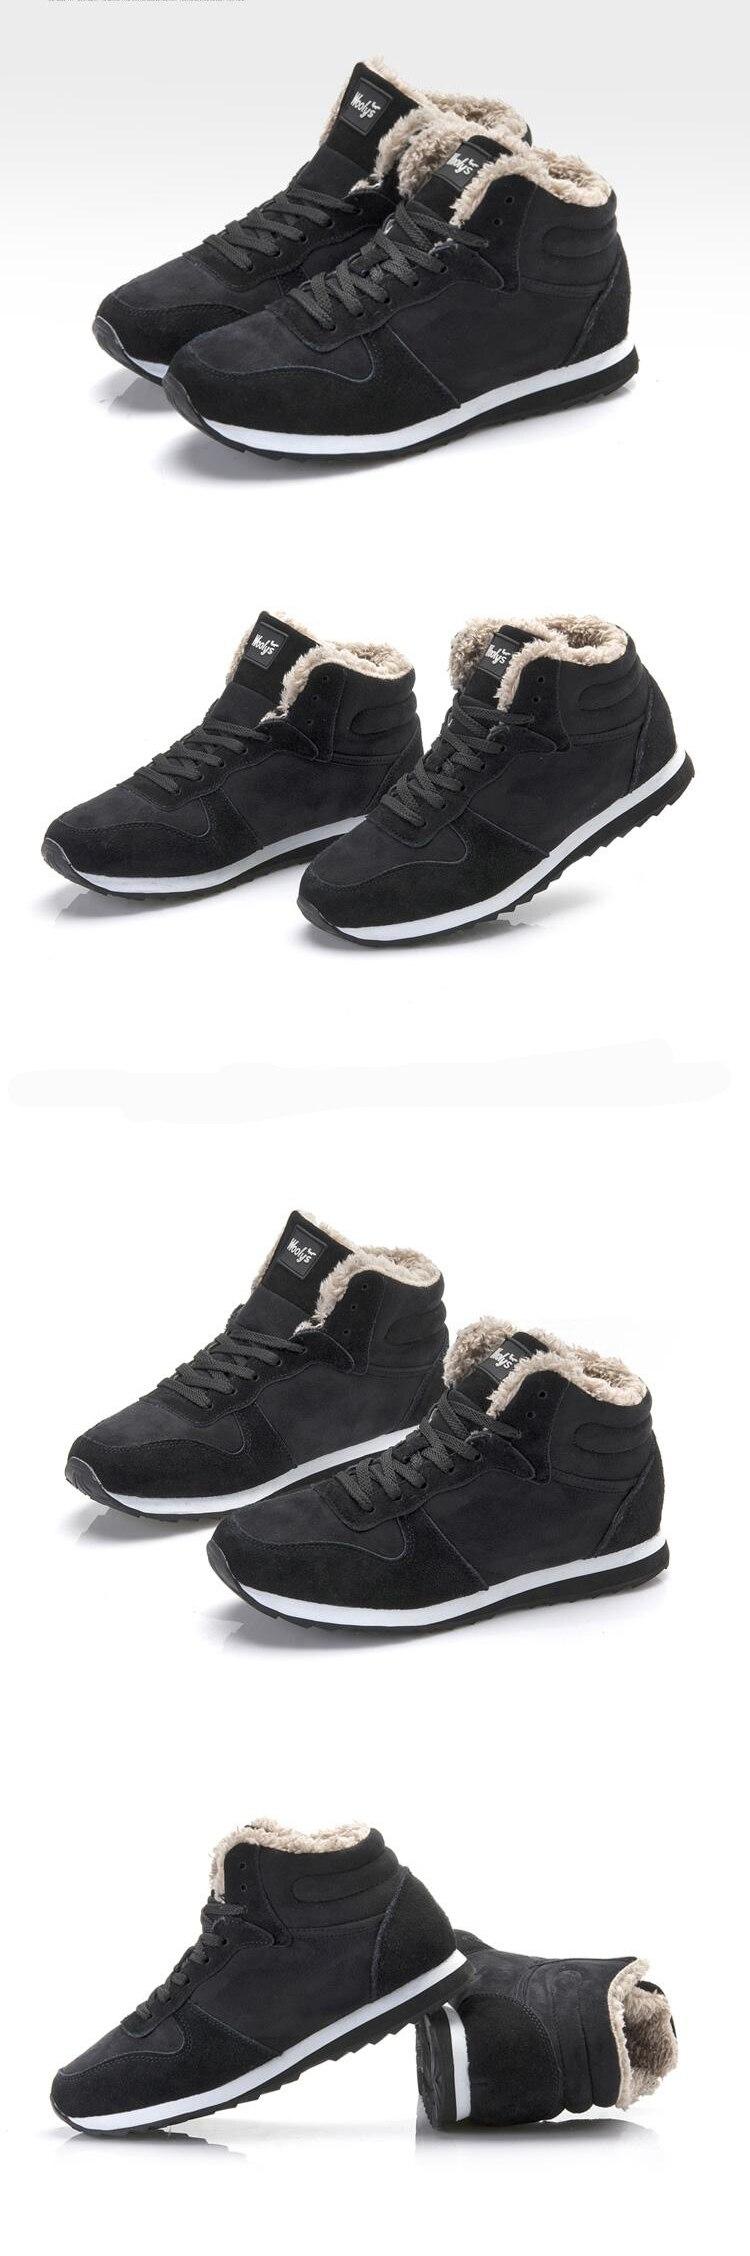 New Couple Unisex Super Warm Man Boot Fashion Men Winter Snow Boots Keep Warm Boots Plush Ankle Work Shoes Men Snow Boots 36-48 22